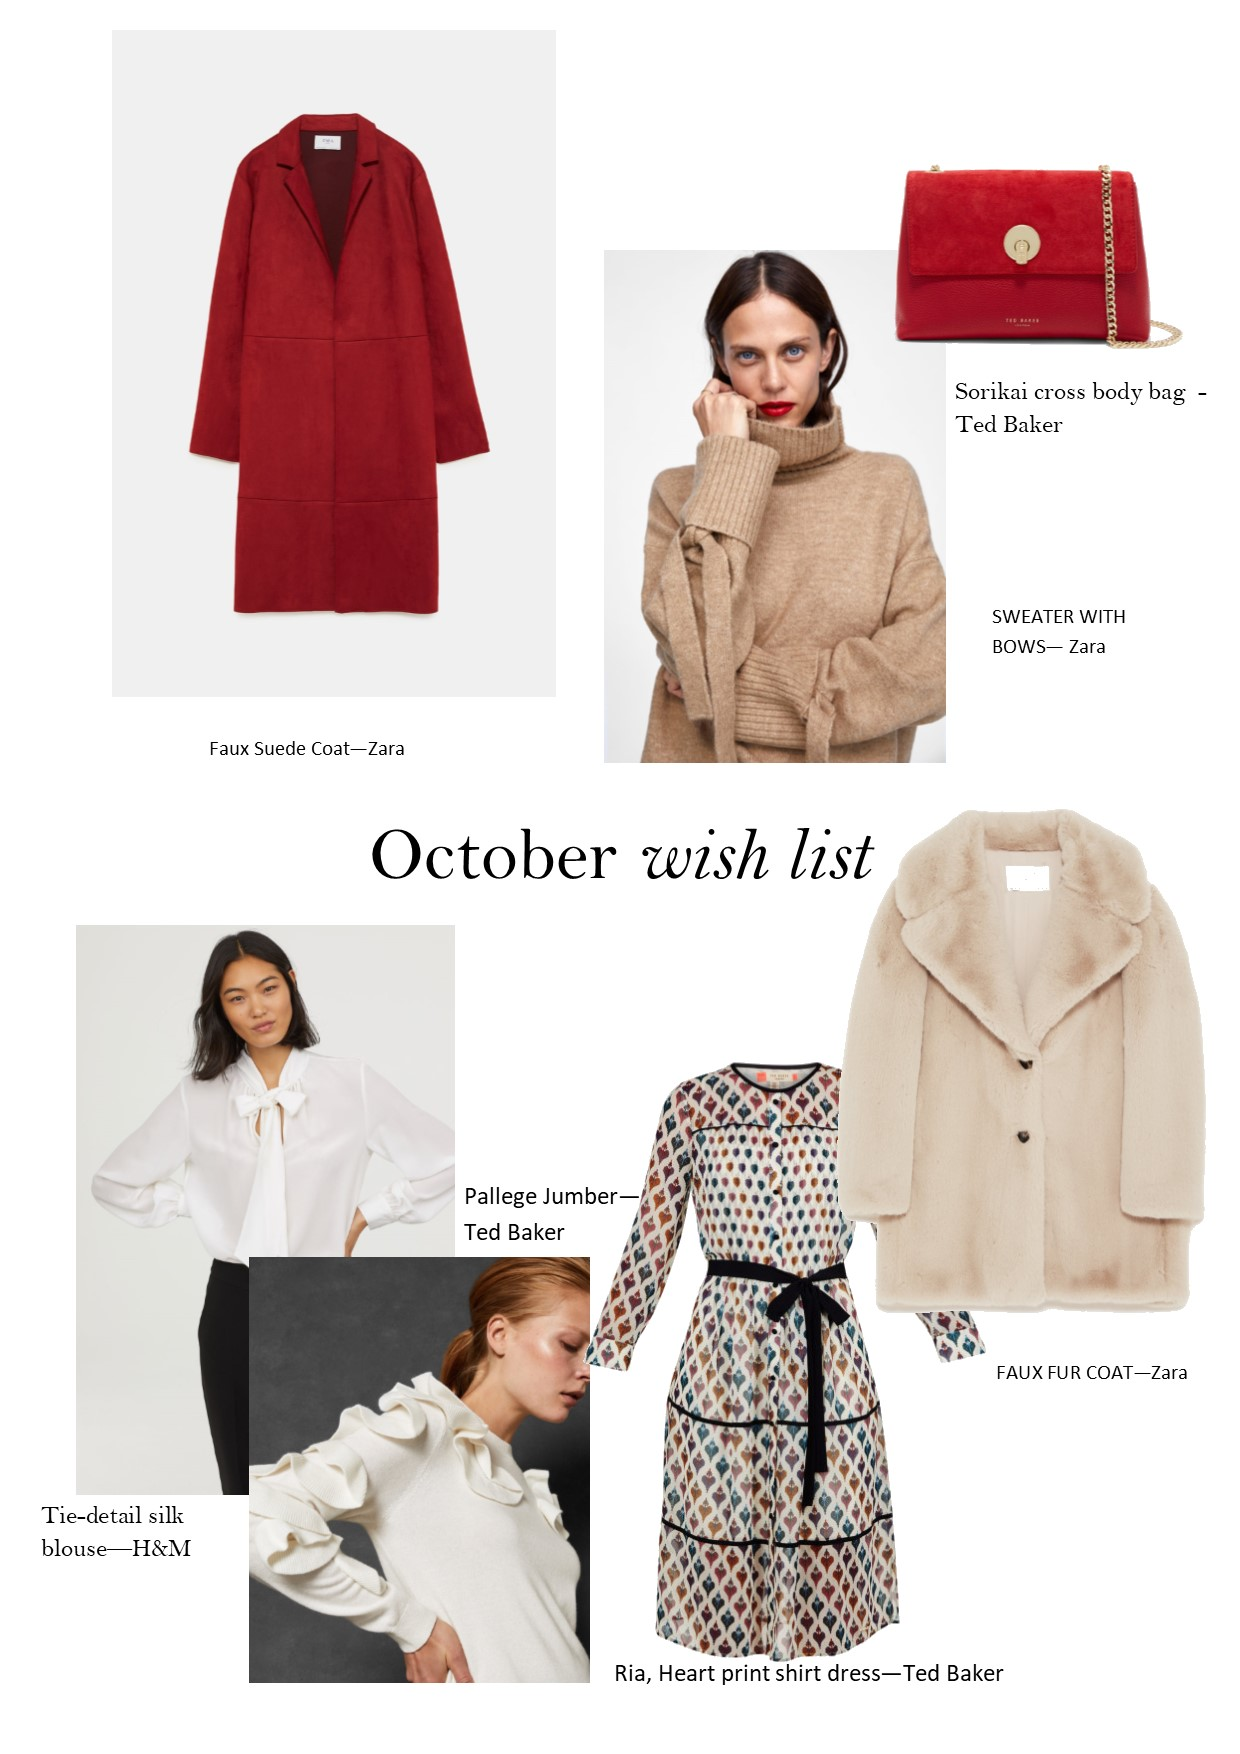 October wish list.jpg